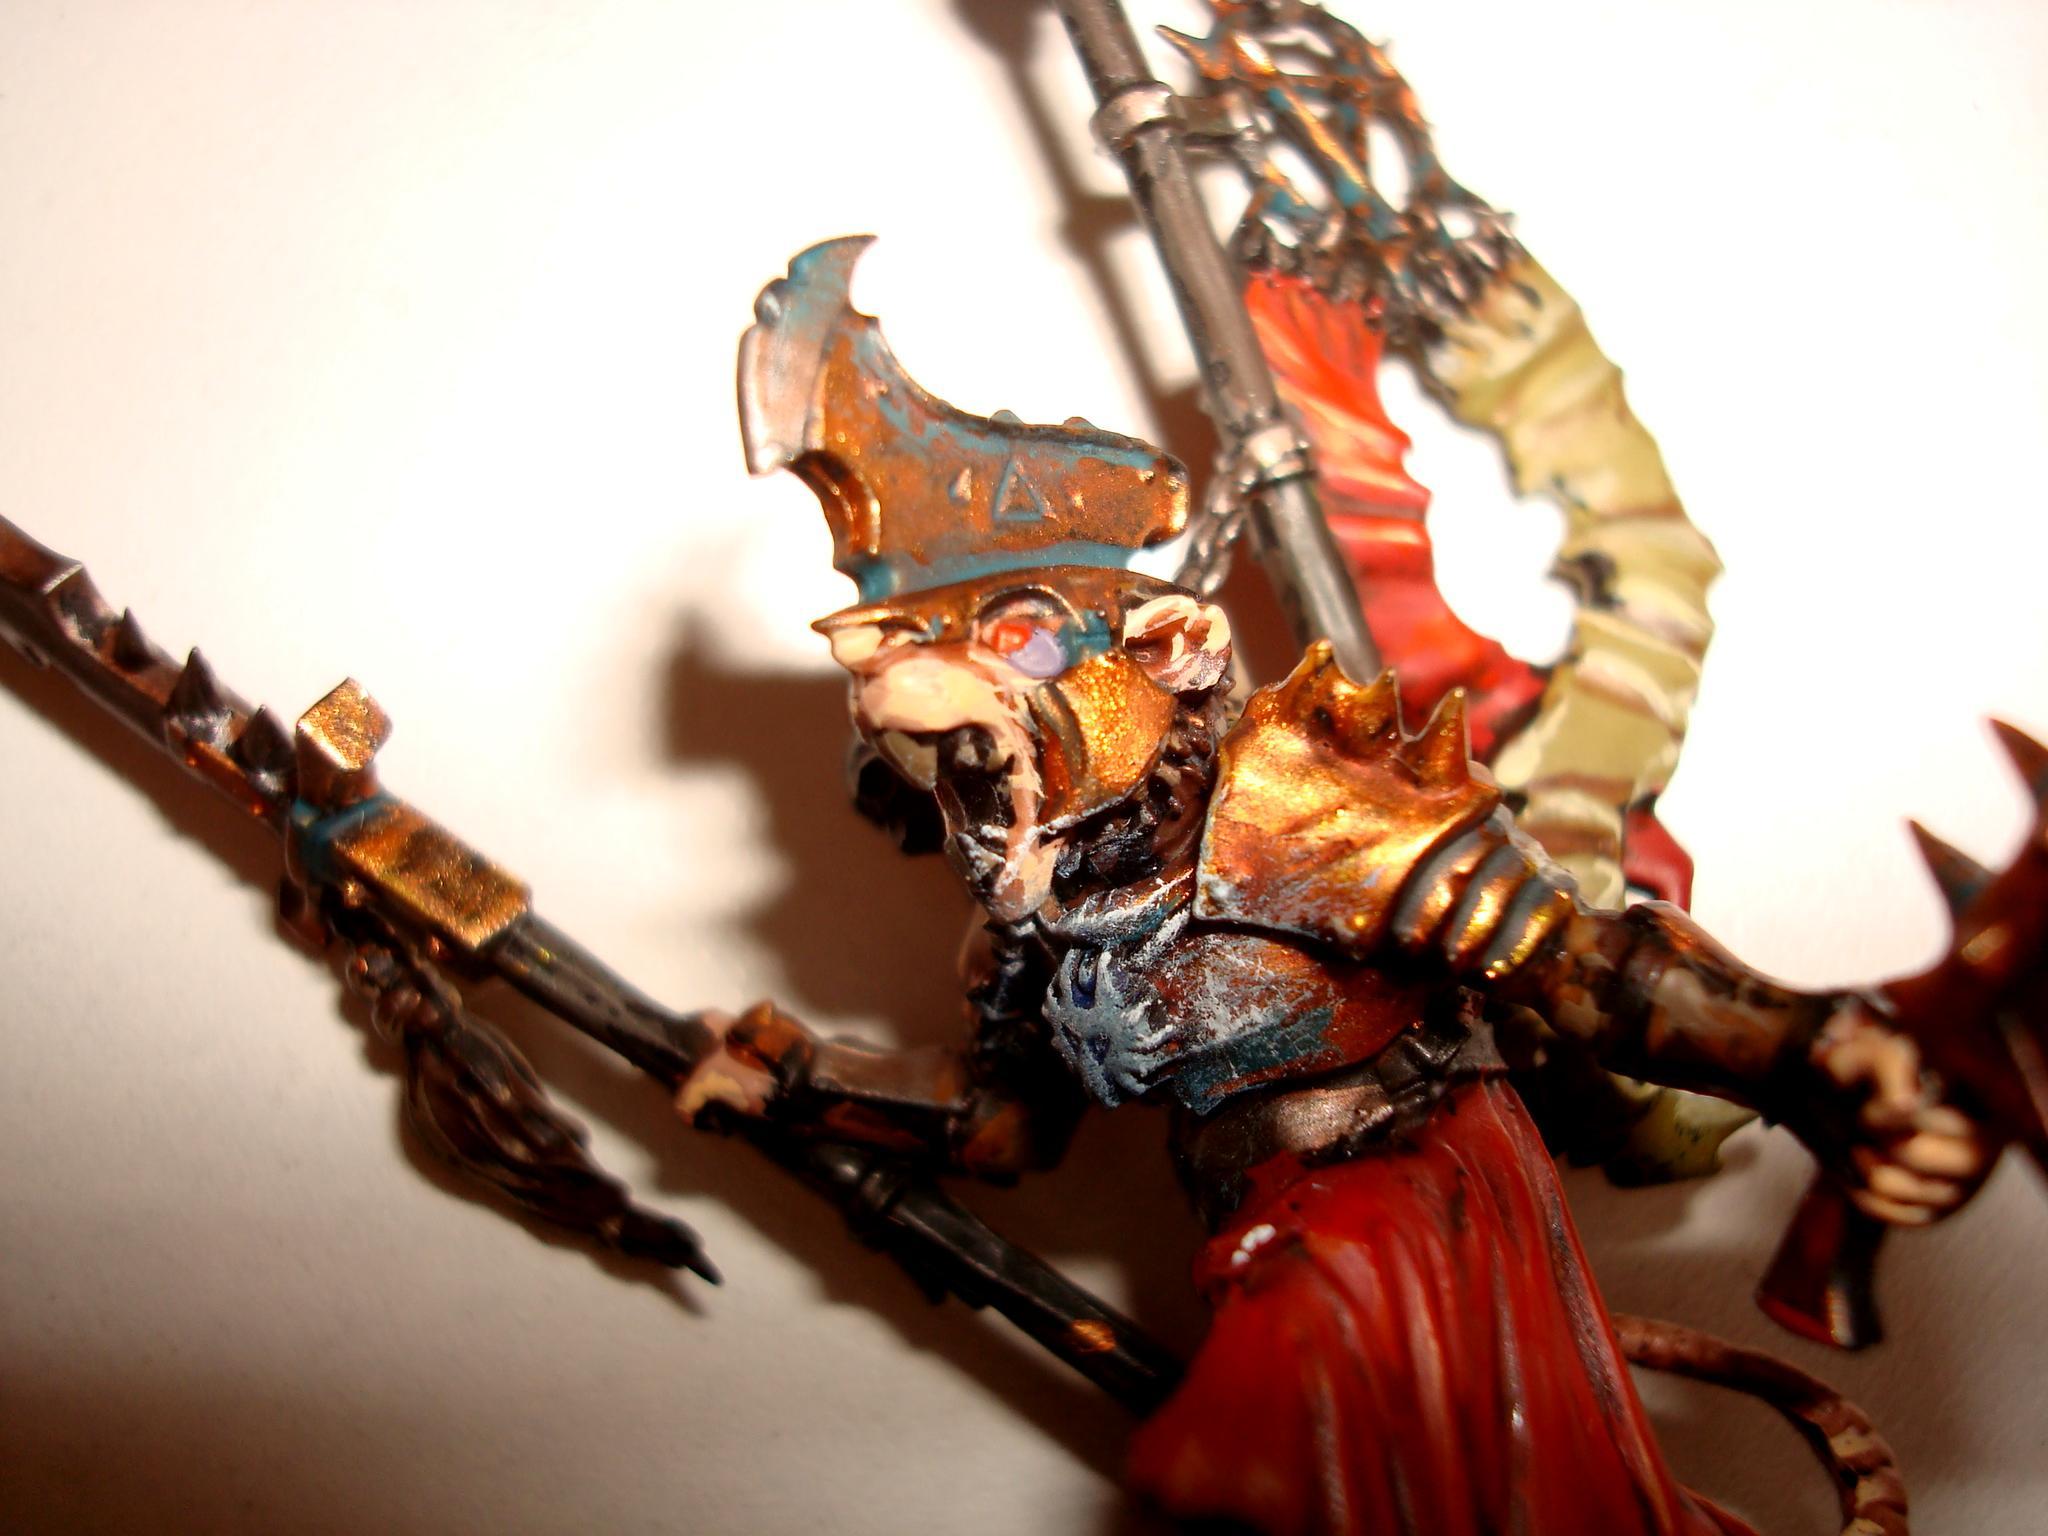 Blood, Island, Of, Skaven, Warlord